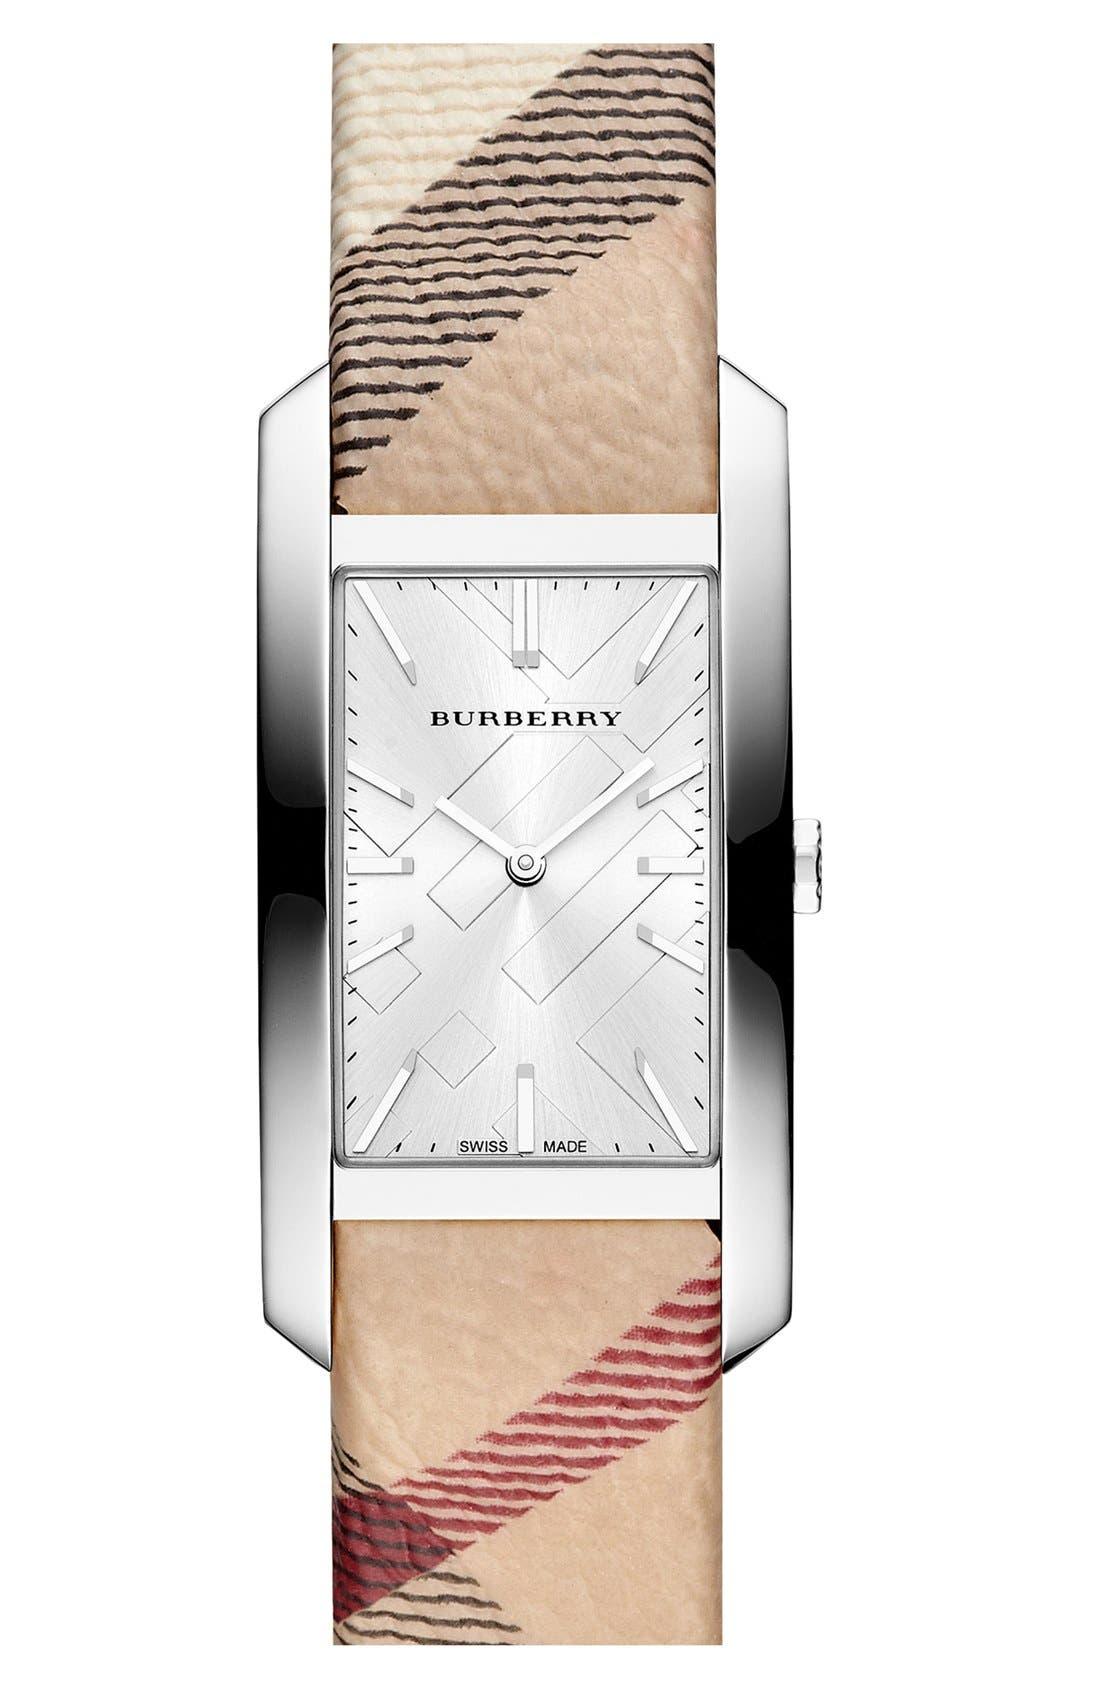 Main Image - Burberry Rectangular Check Strap Watch, 20mm x 26mm